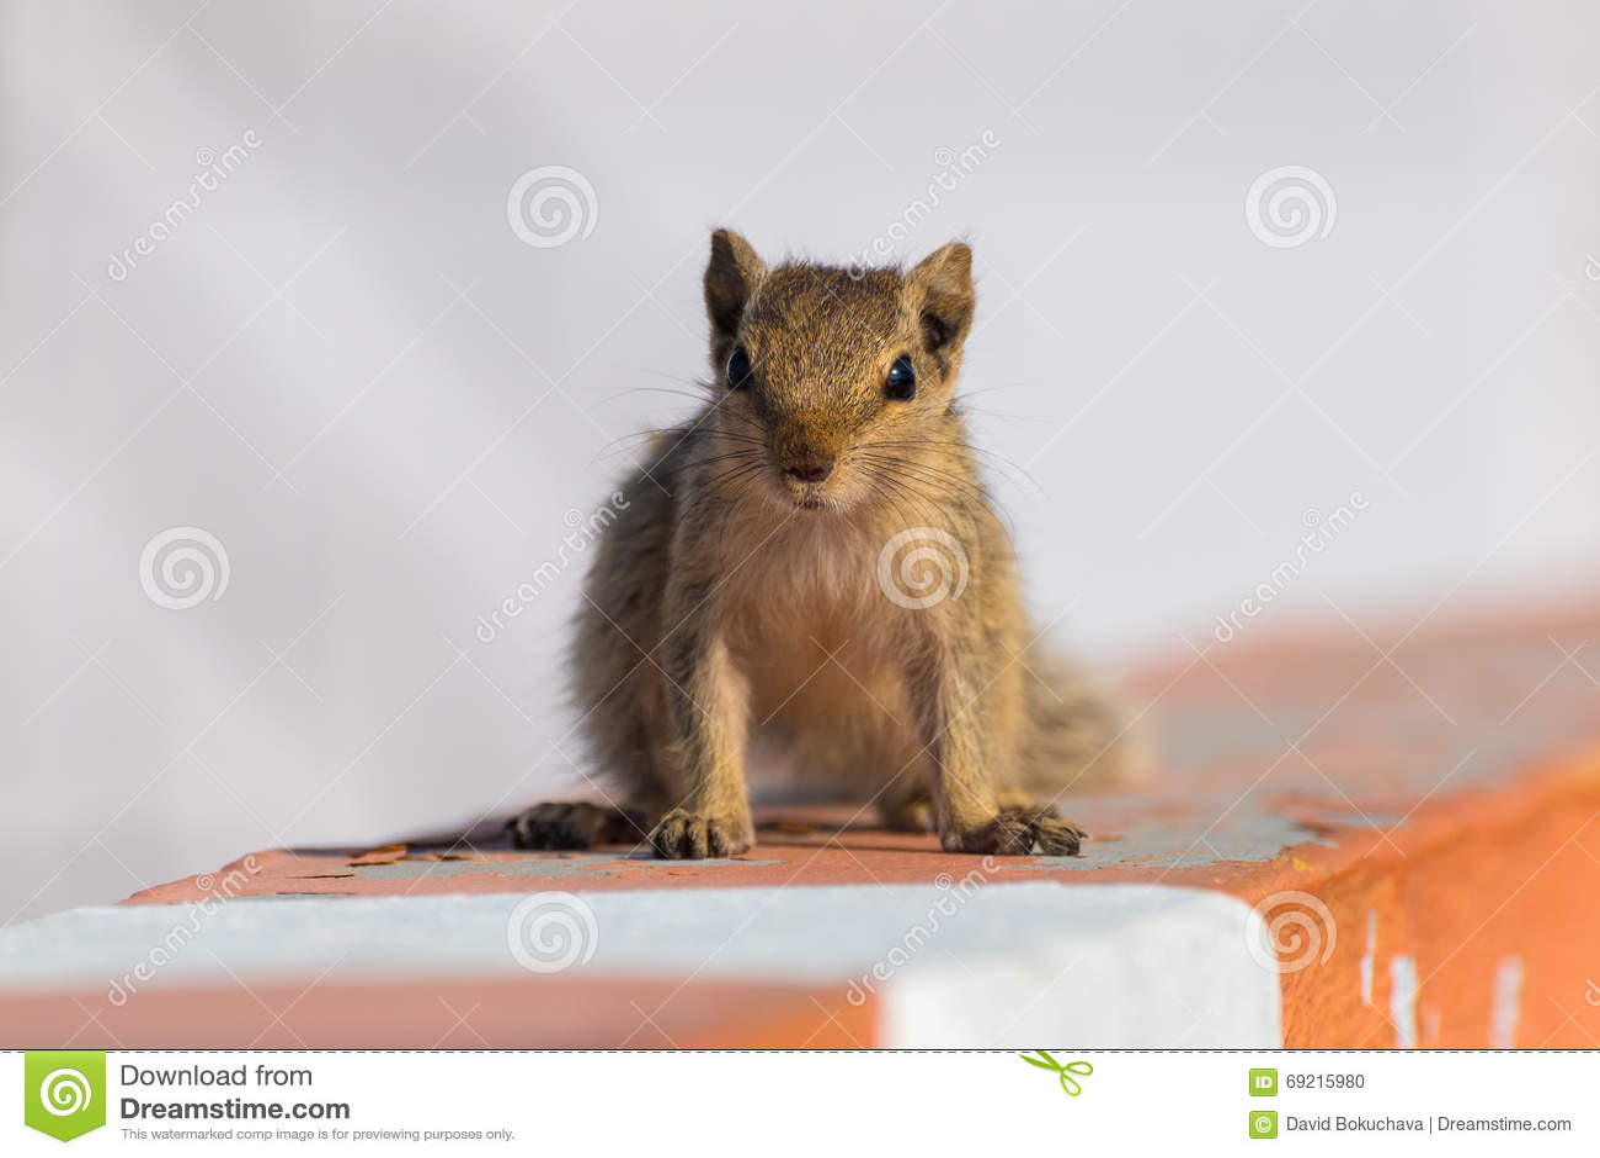 Indian Squirrel Ultra HD Desktop Background Wallpaper for ... |Indian Squirrel Wallpaper